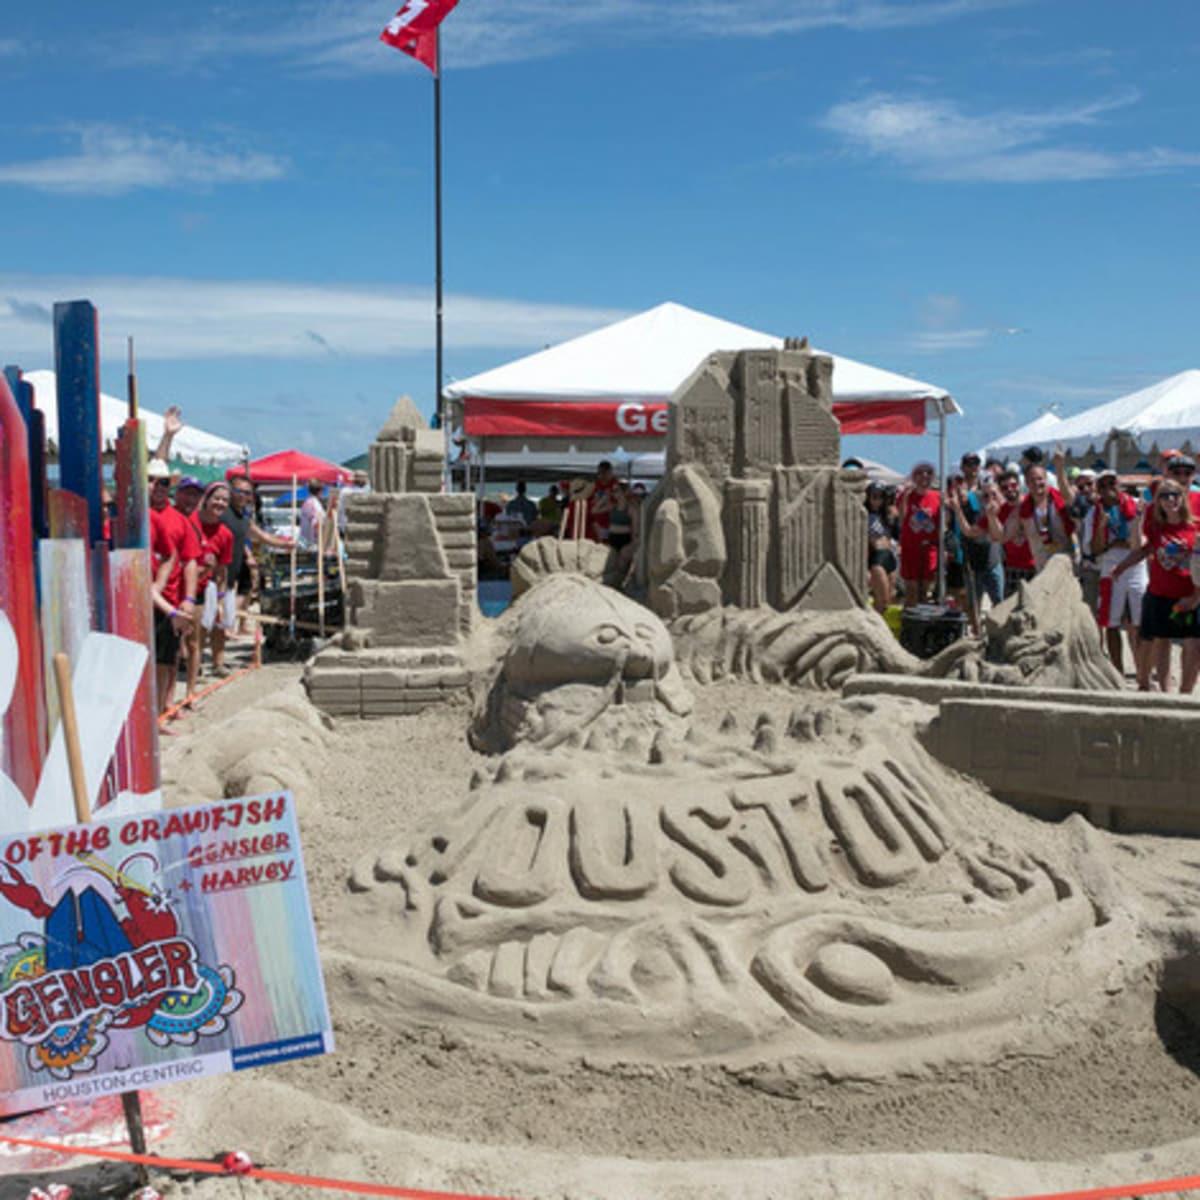 Houston, Houzz series, June 2017, Sandcastle contest, Return of the Crawfish